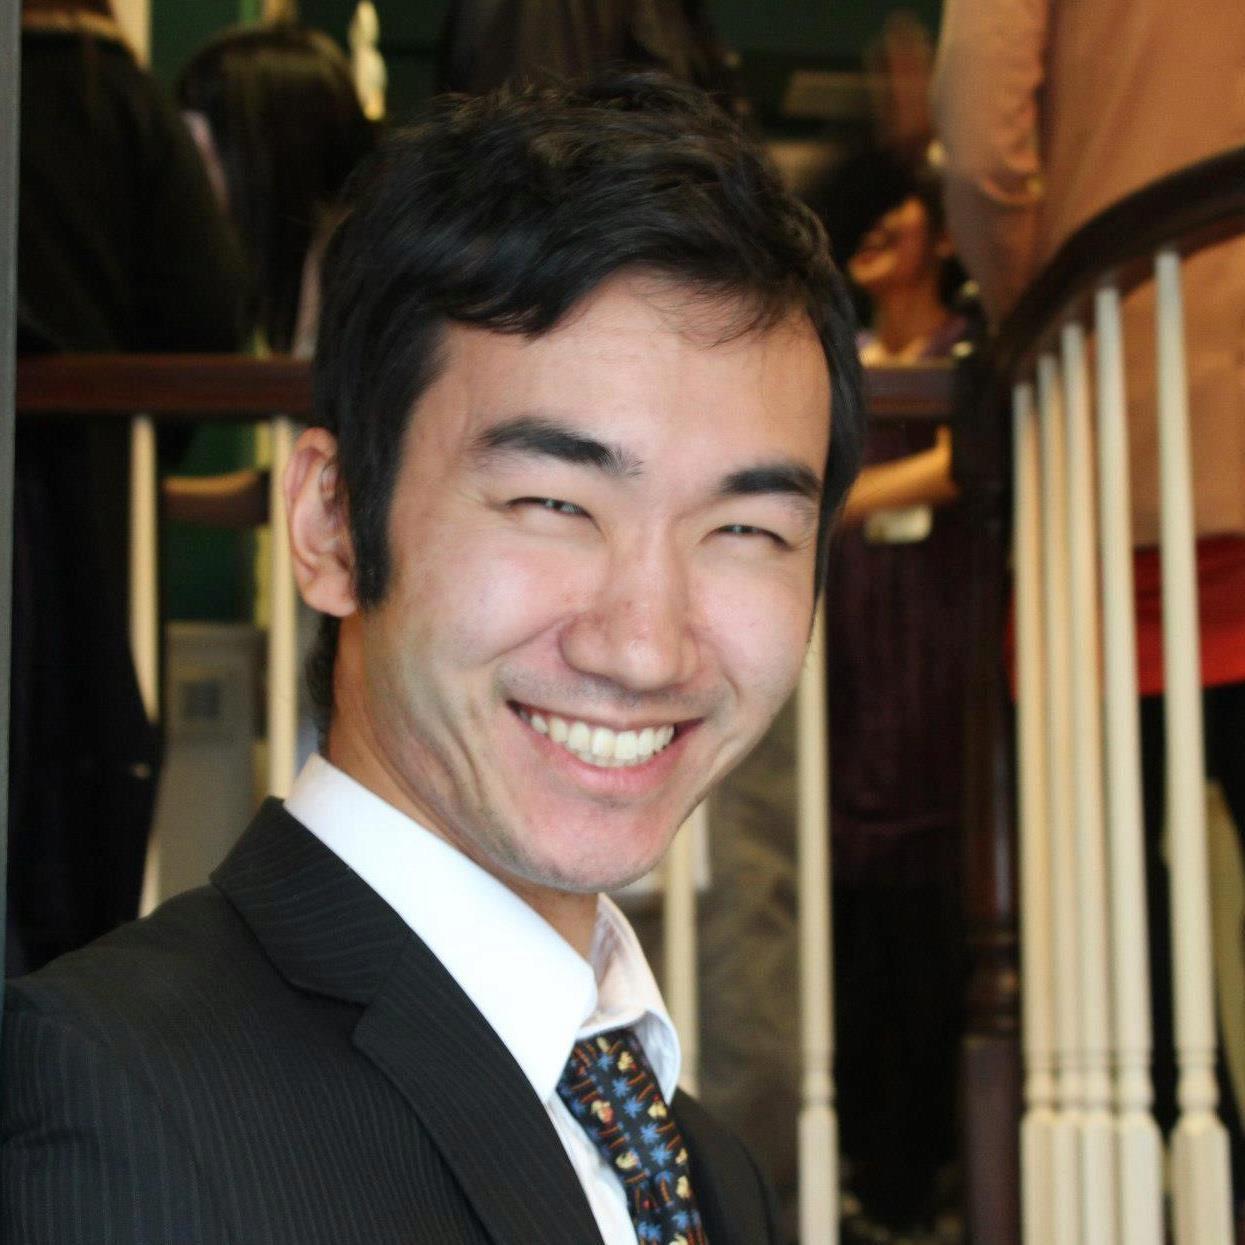 Hideto Koizumi